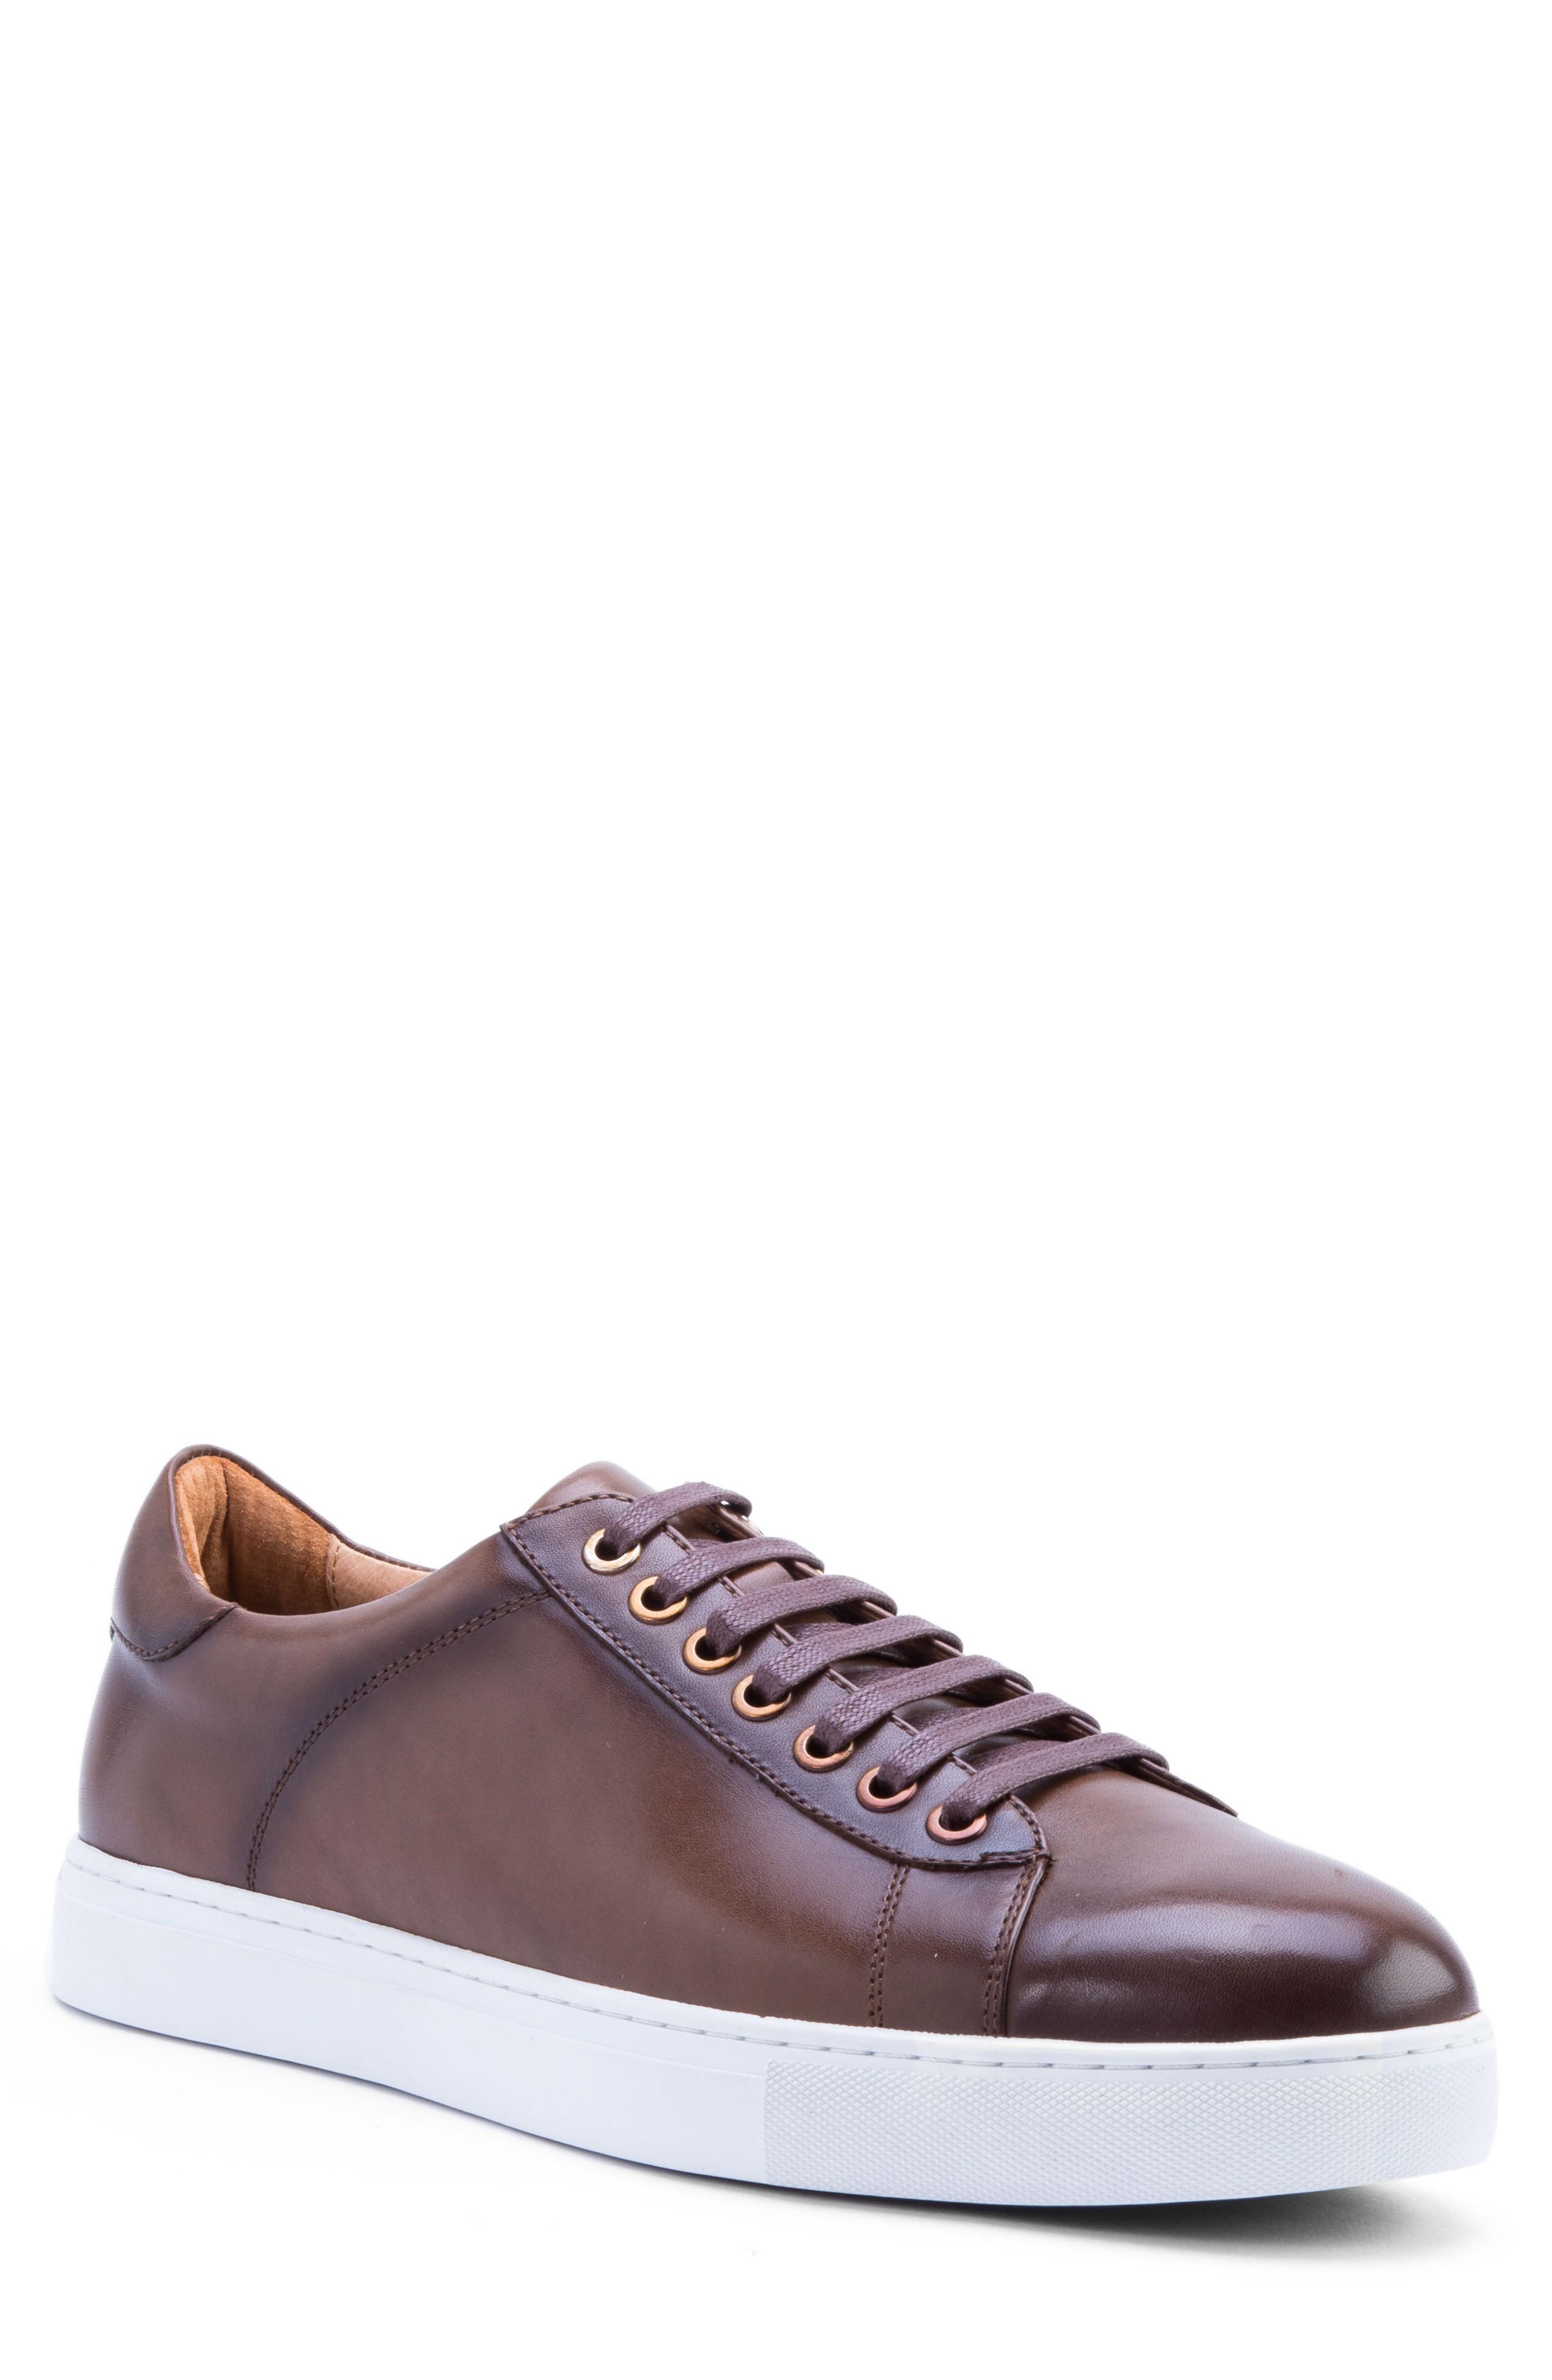 Zanzara Music Low Top Sneaker In Brown Leather